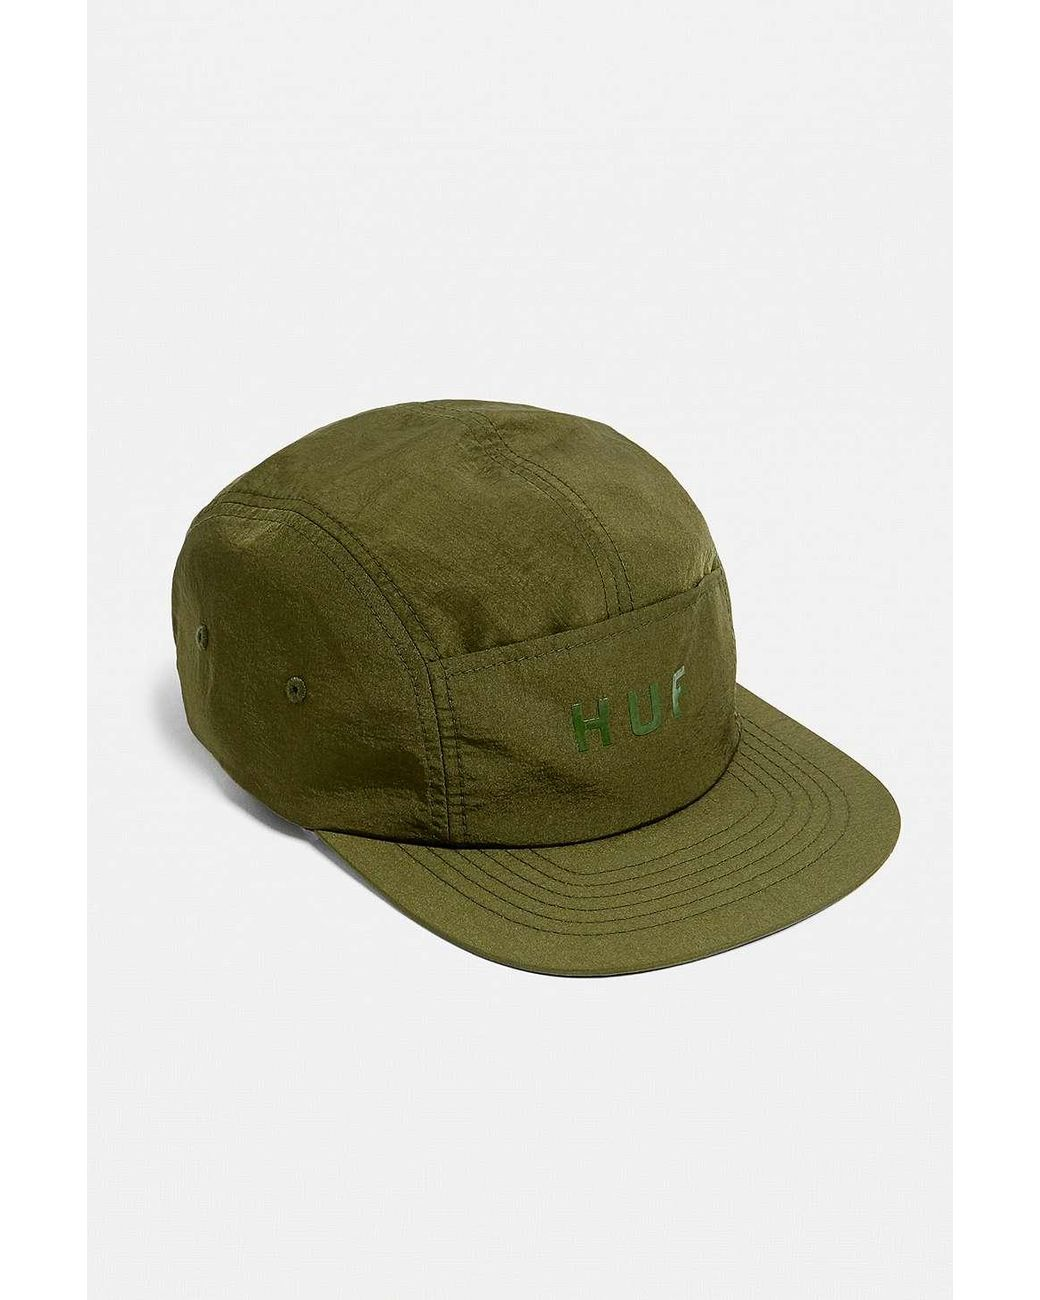 98dce4d1 Huf Pocket Khaki Camp Cap - Mens All in Green for Men - Lyst